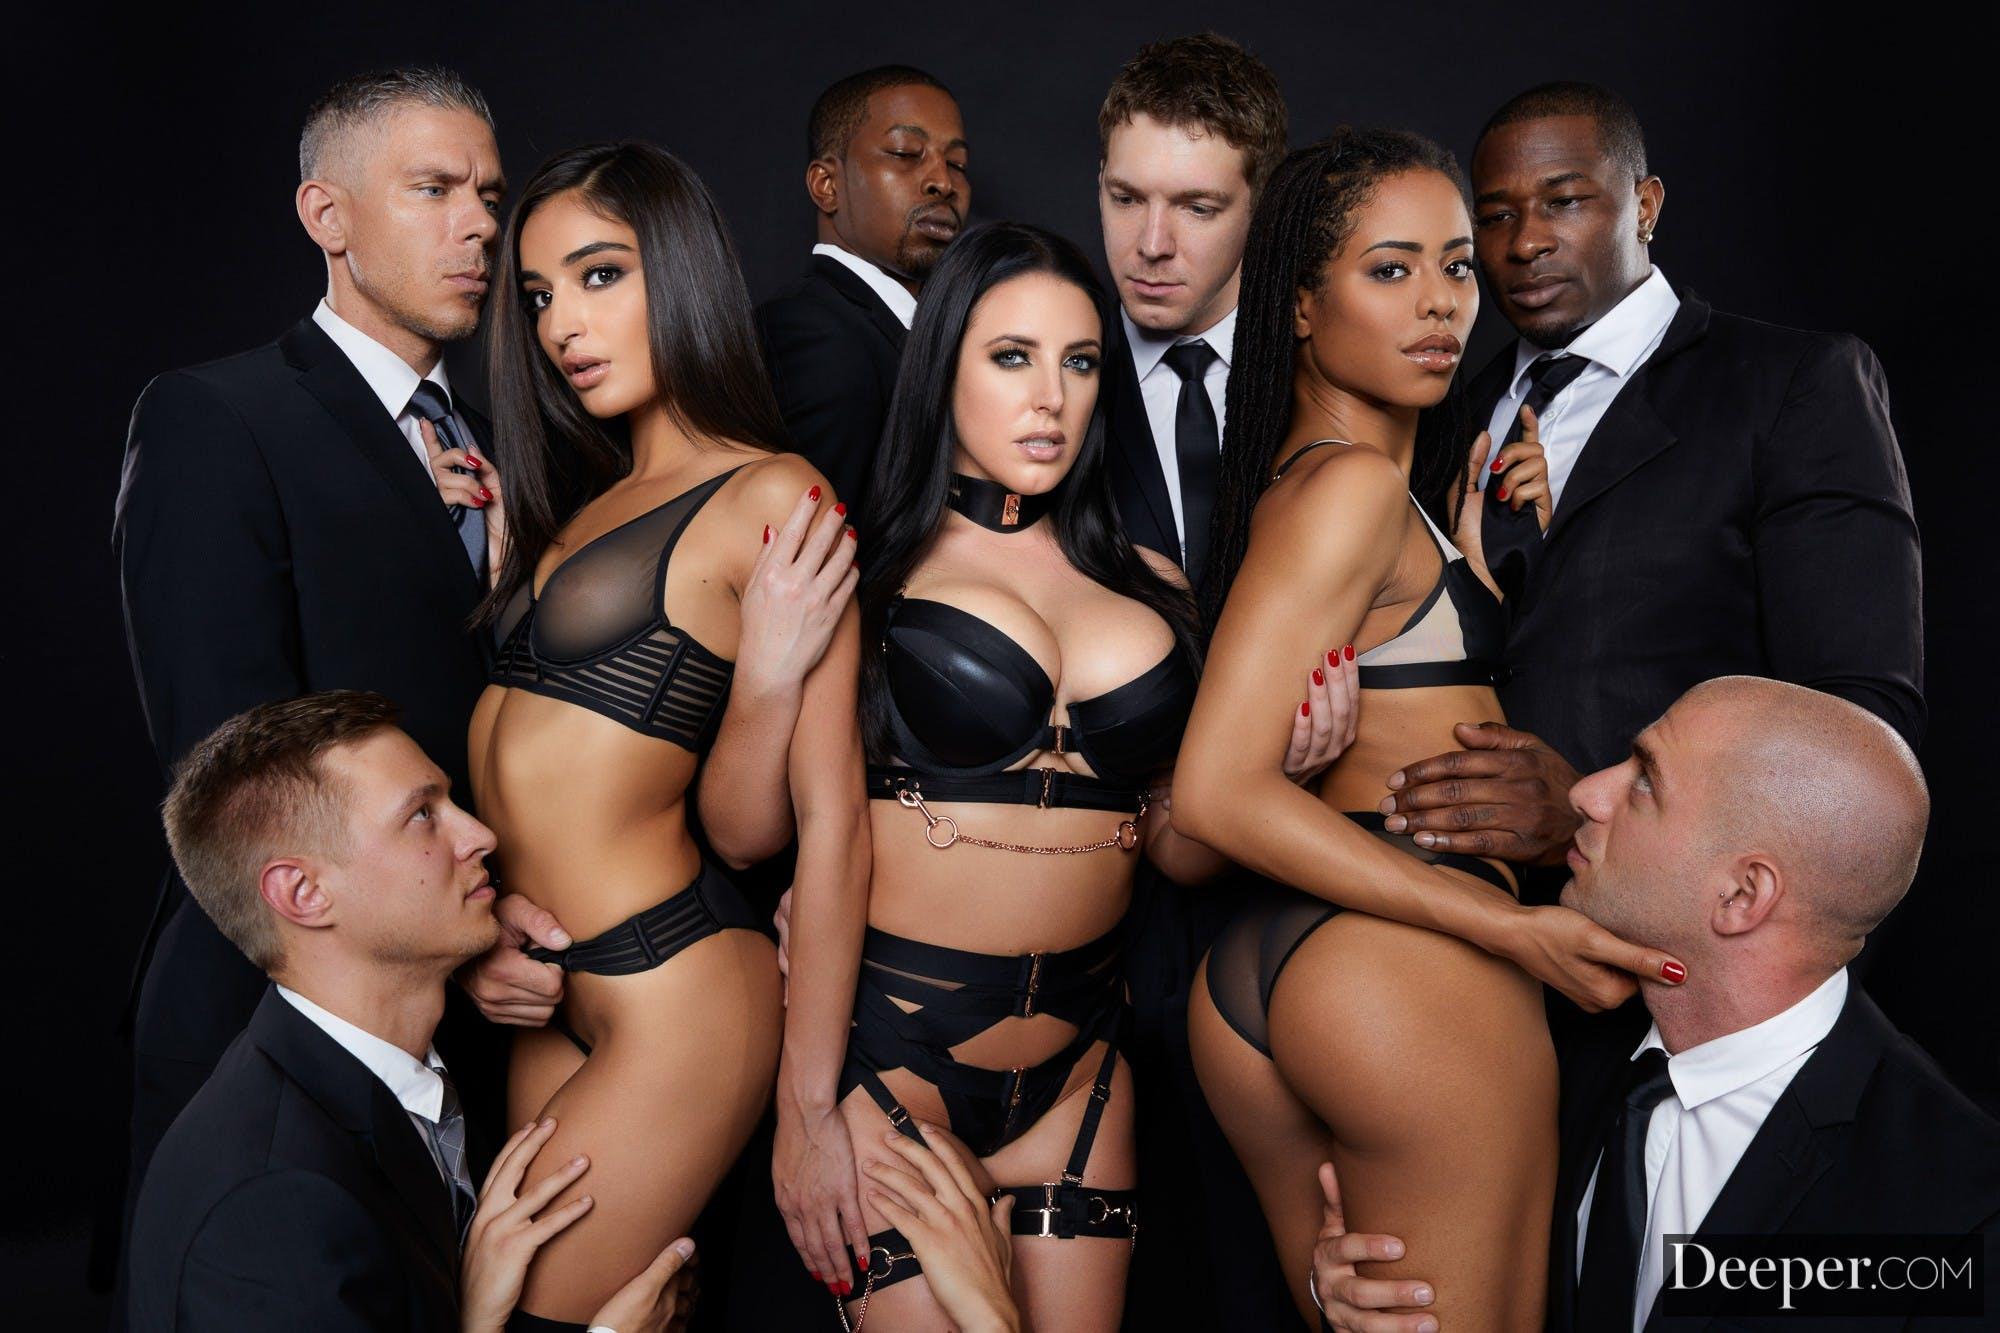 orgy porn kinky group sex deeper Angela White Emily Willis Kira Noir Markus Dupree Mick Blue Isiah Maxwell Rob Piper